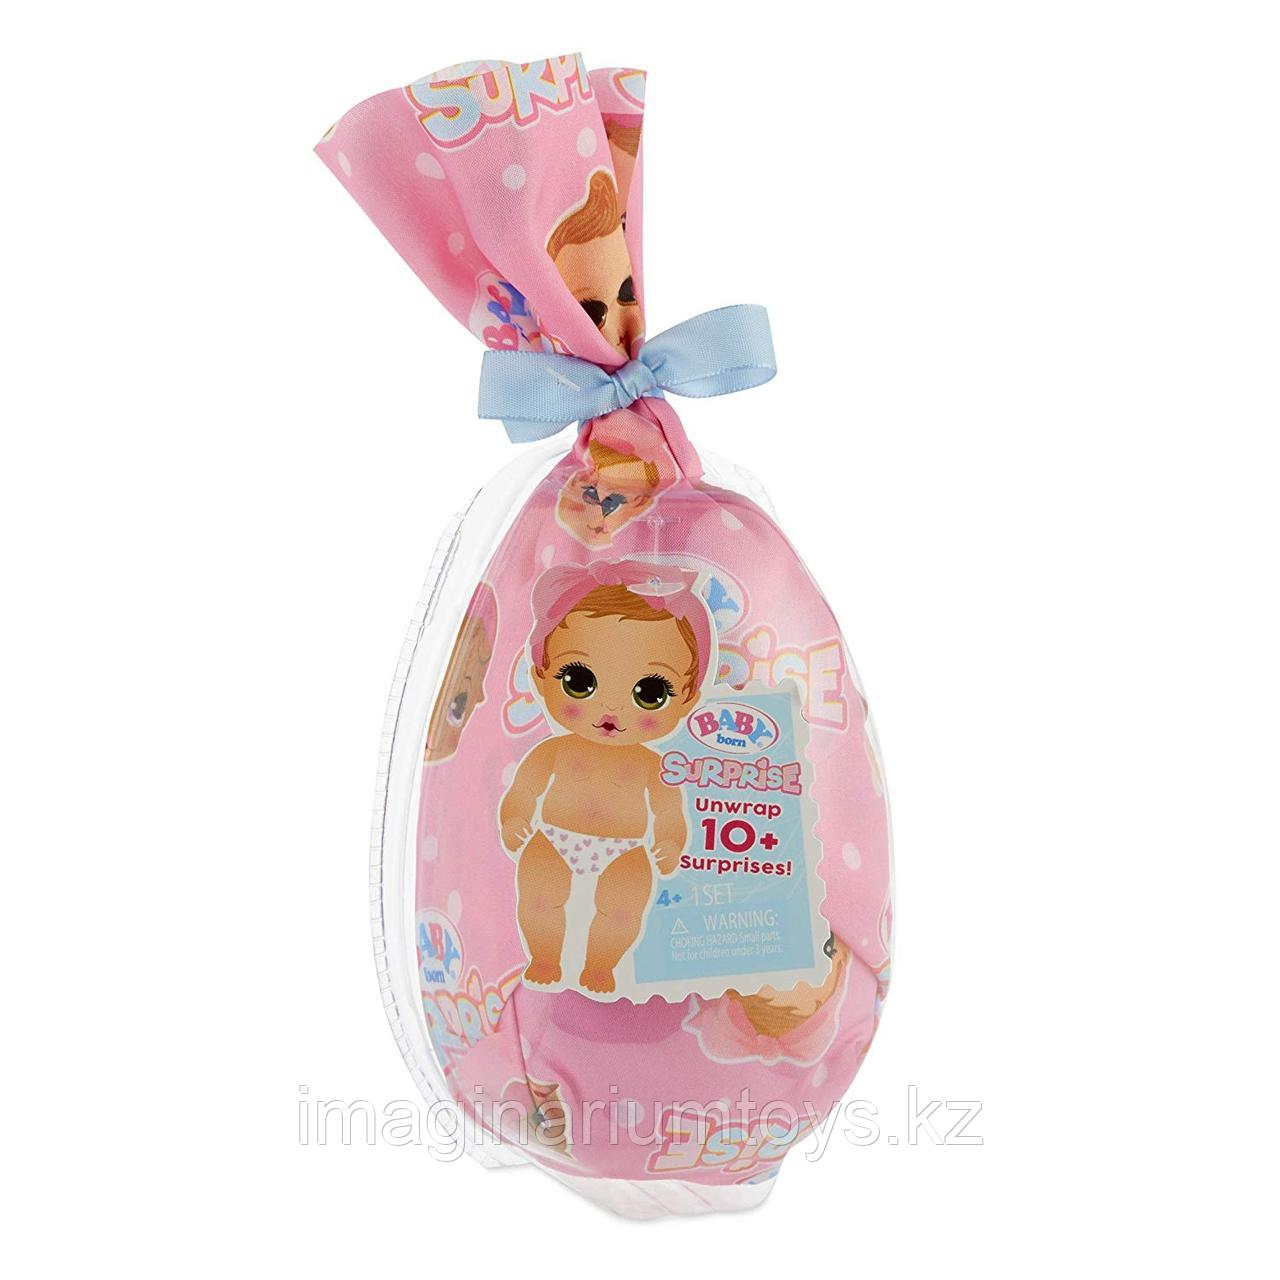 Baby Born Surprise новинка Zapf Creation